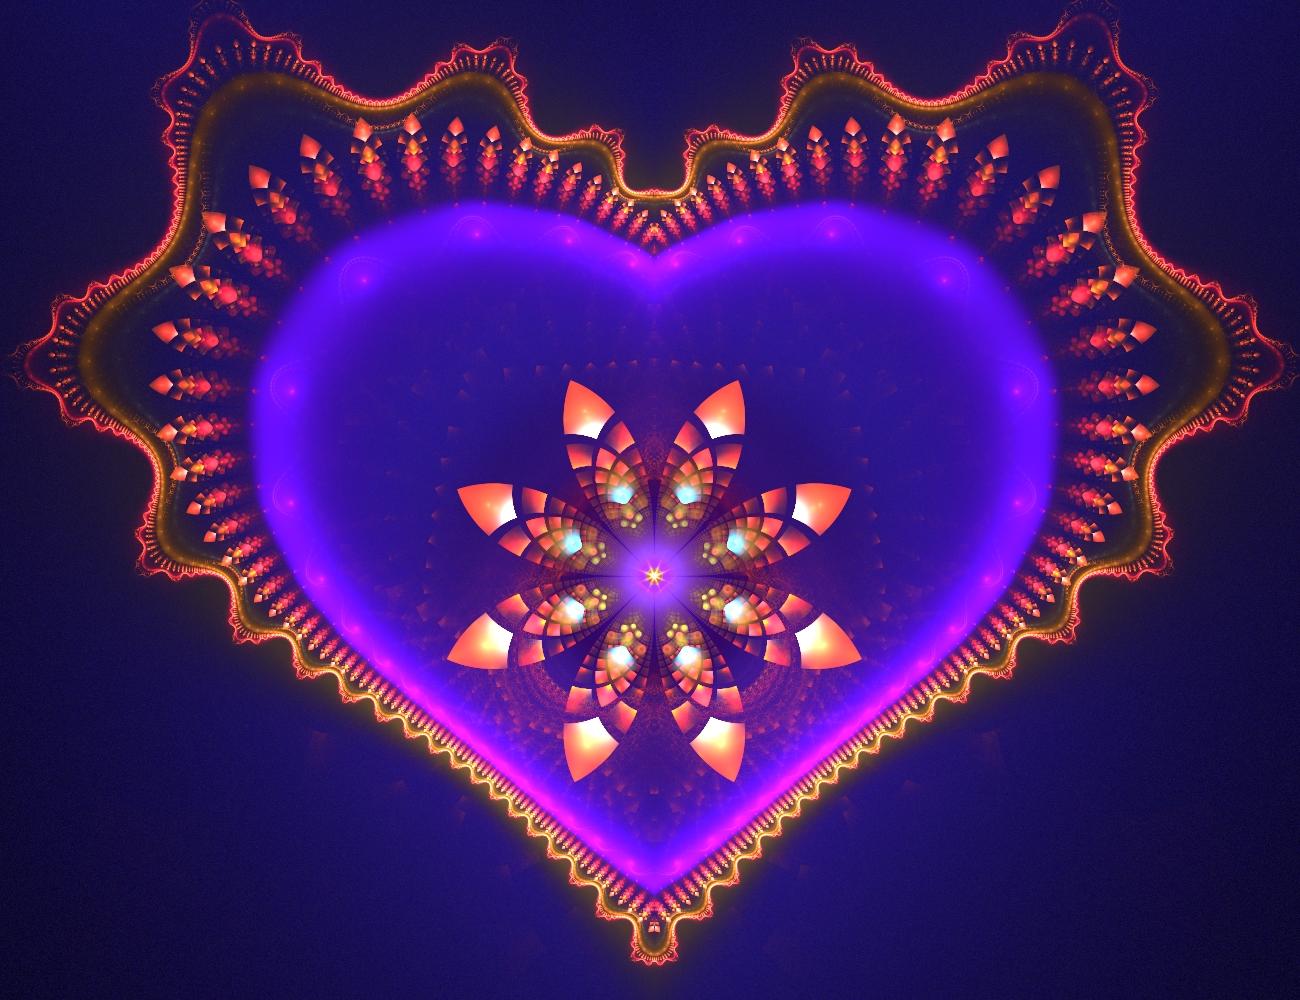 heart by kimsmile